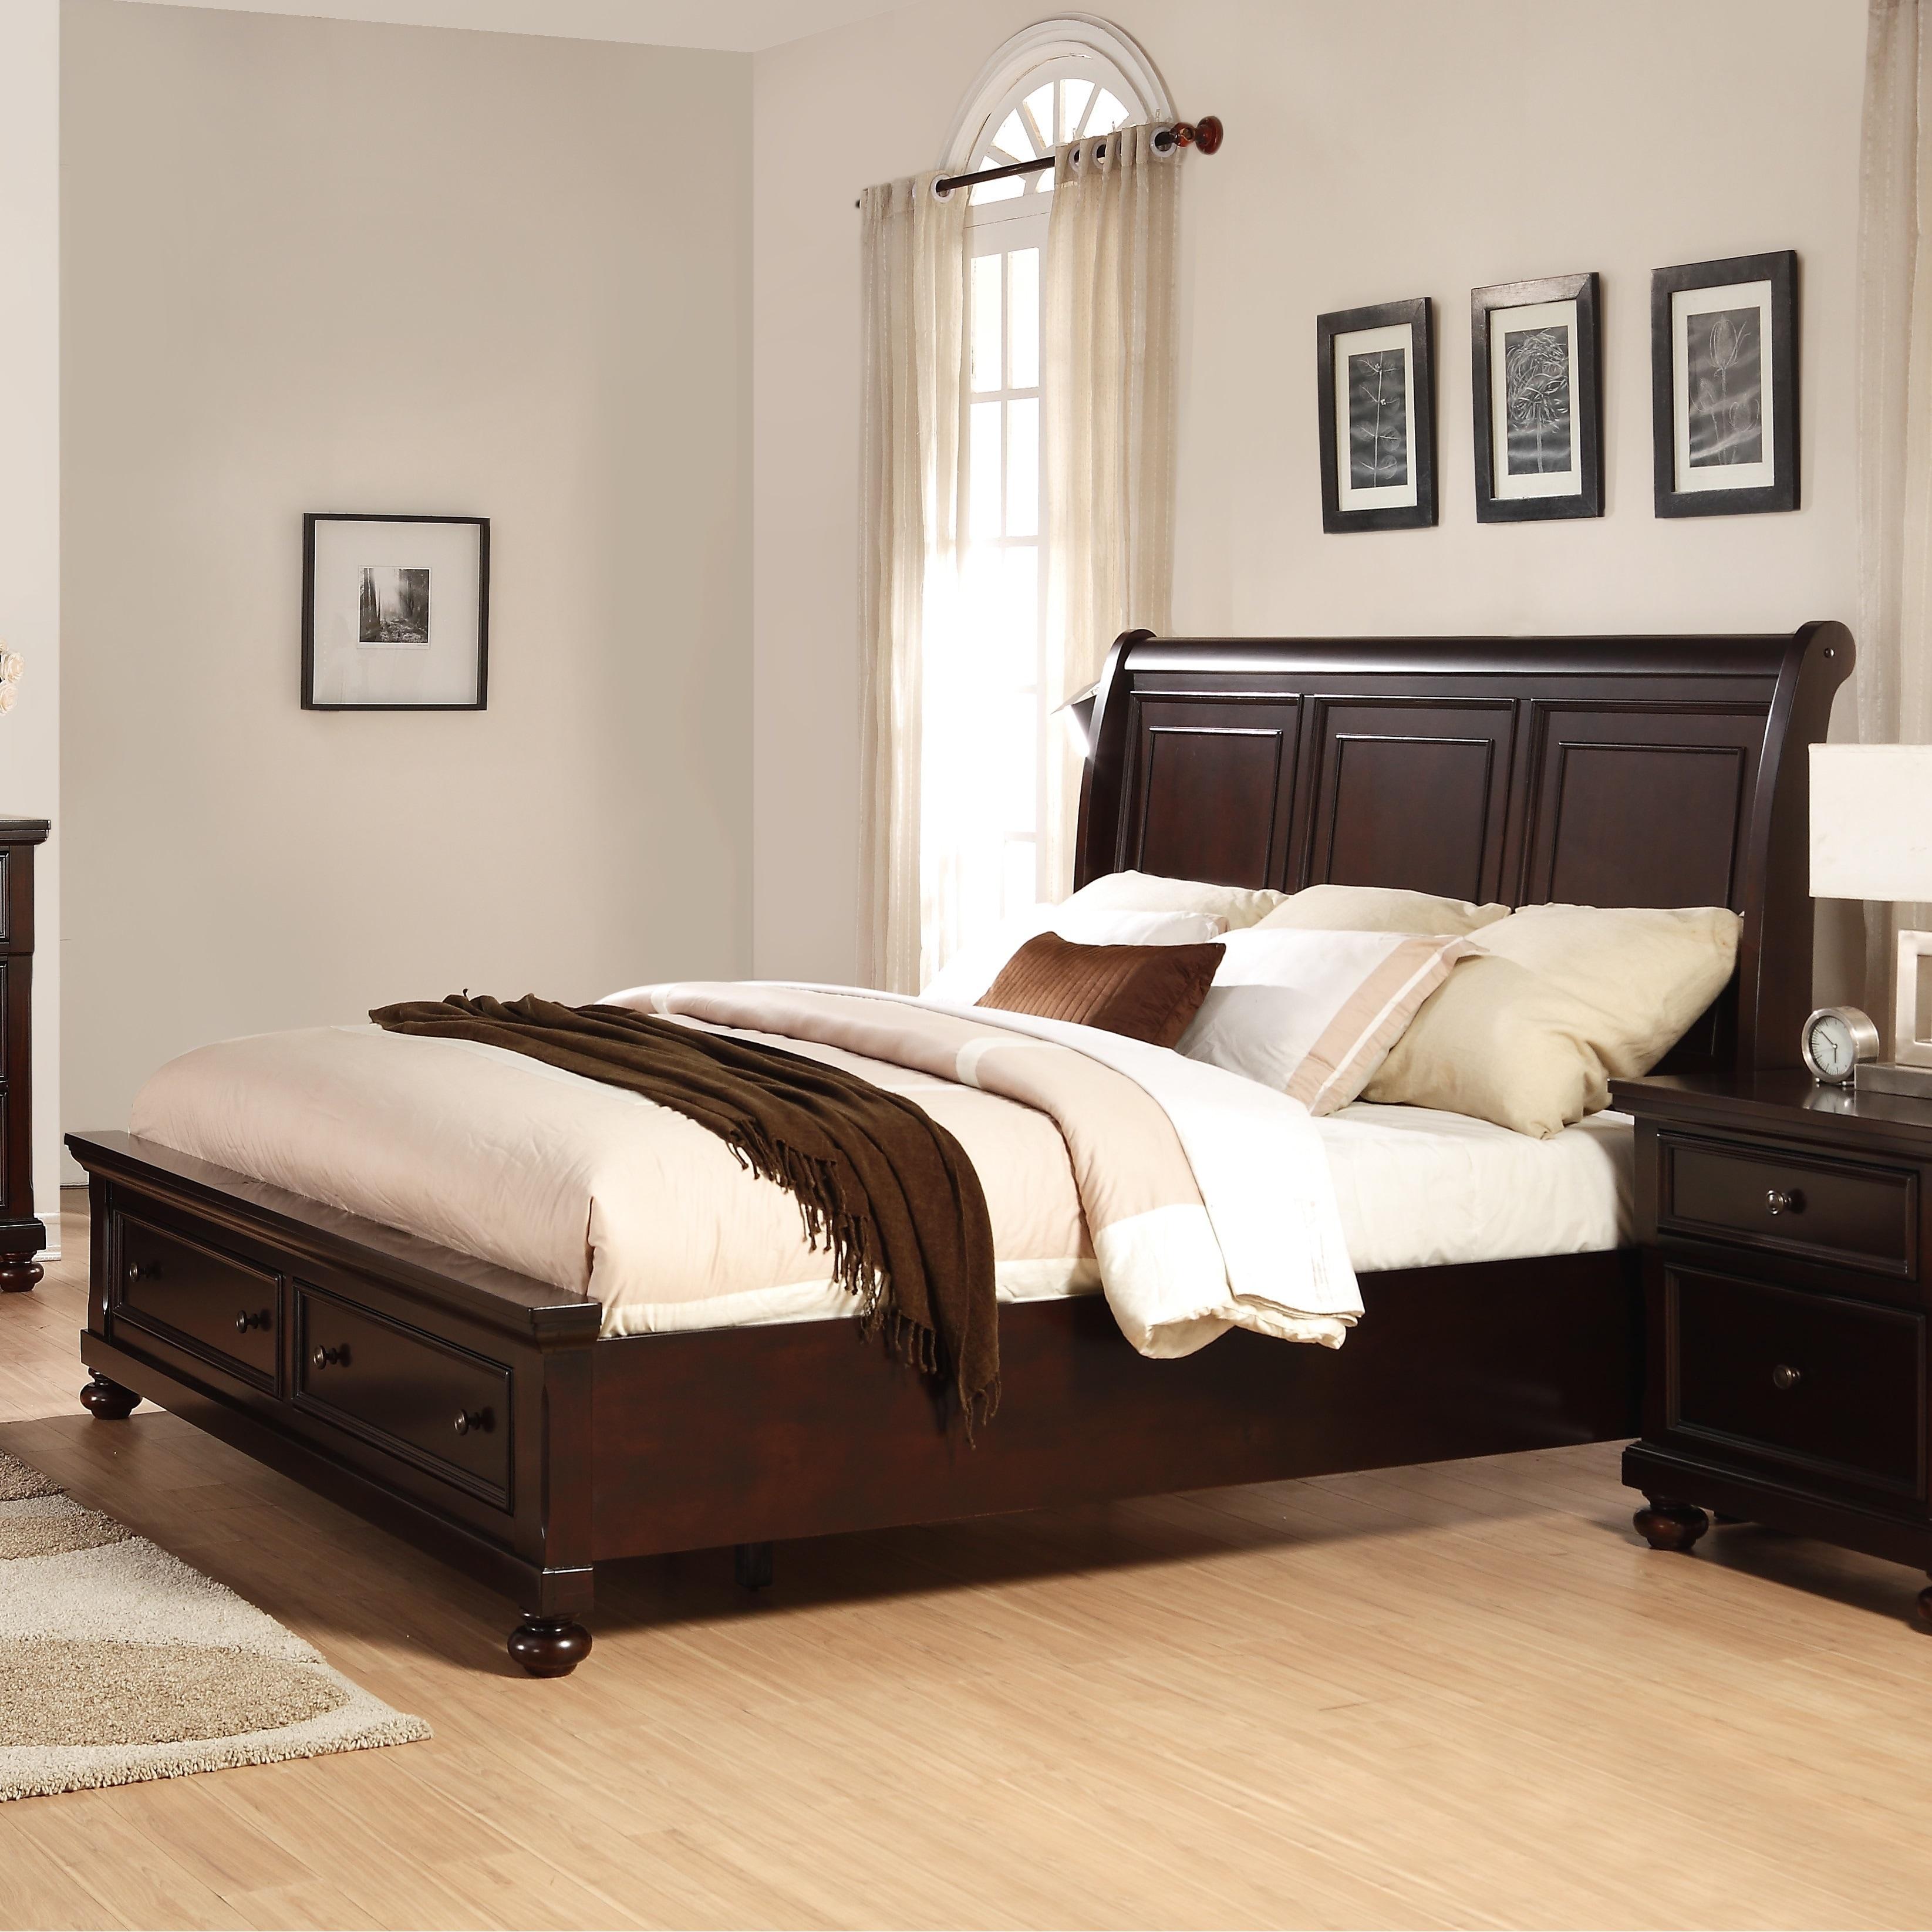 Brishland Rustic Cherry Wooden Queen-size Storage Bed - Free ...